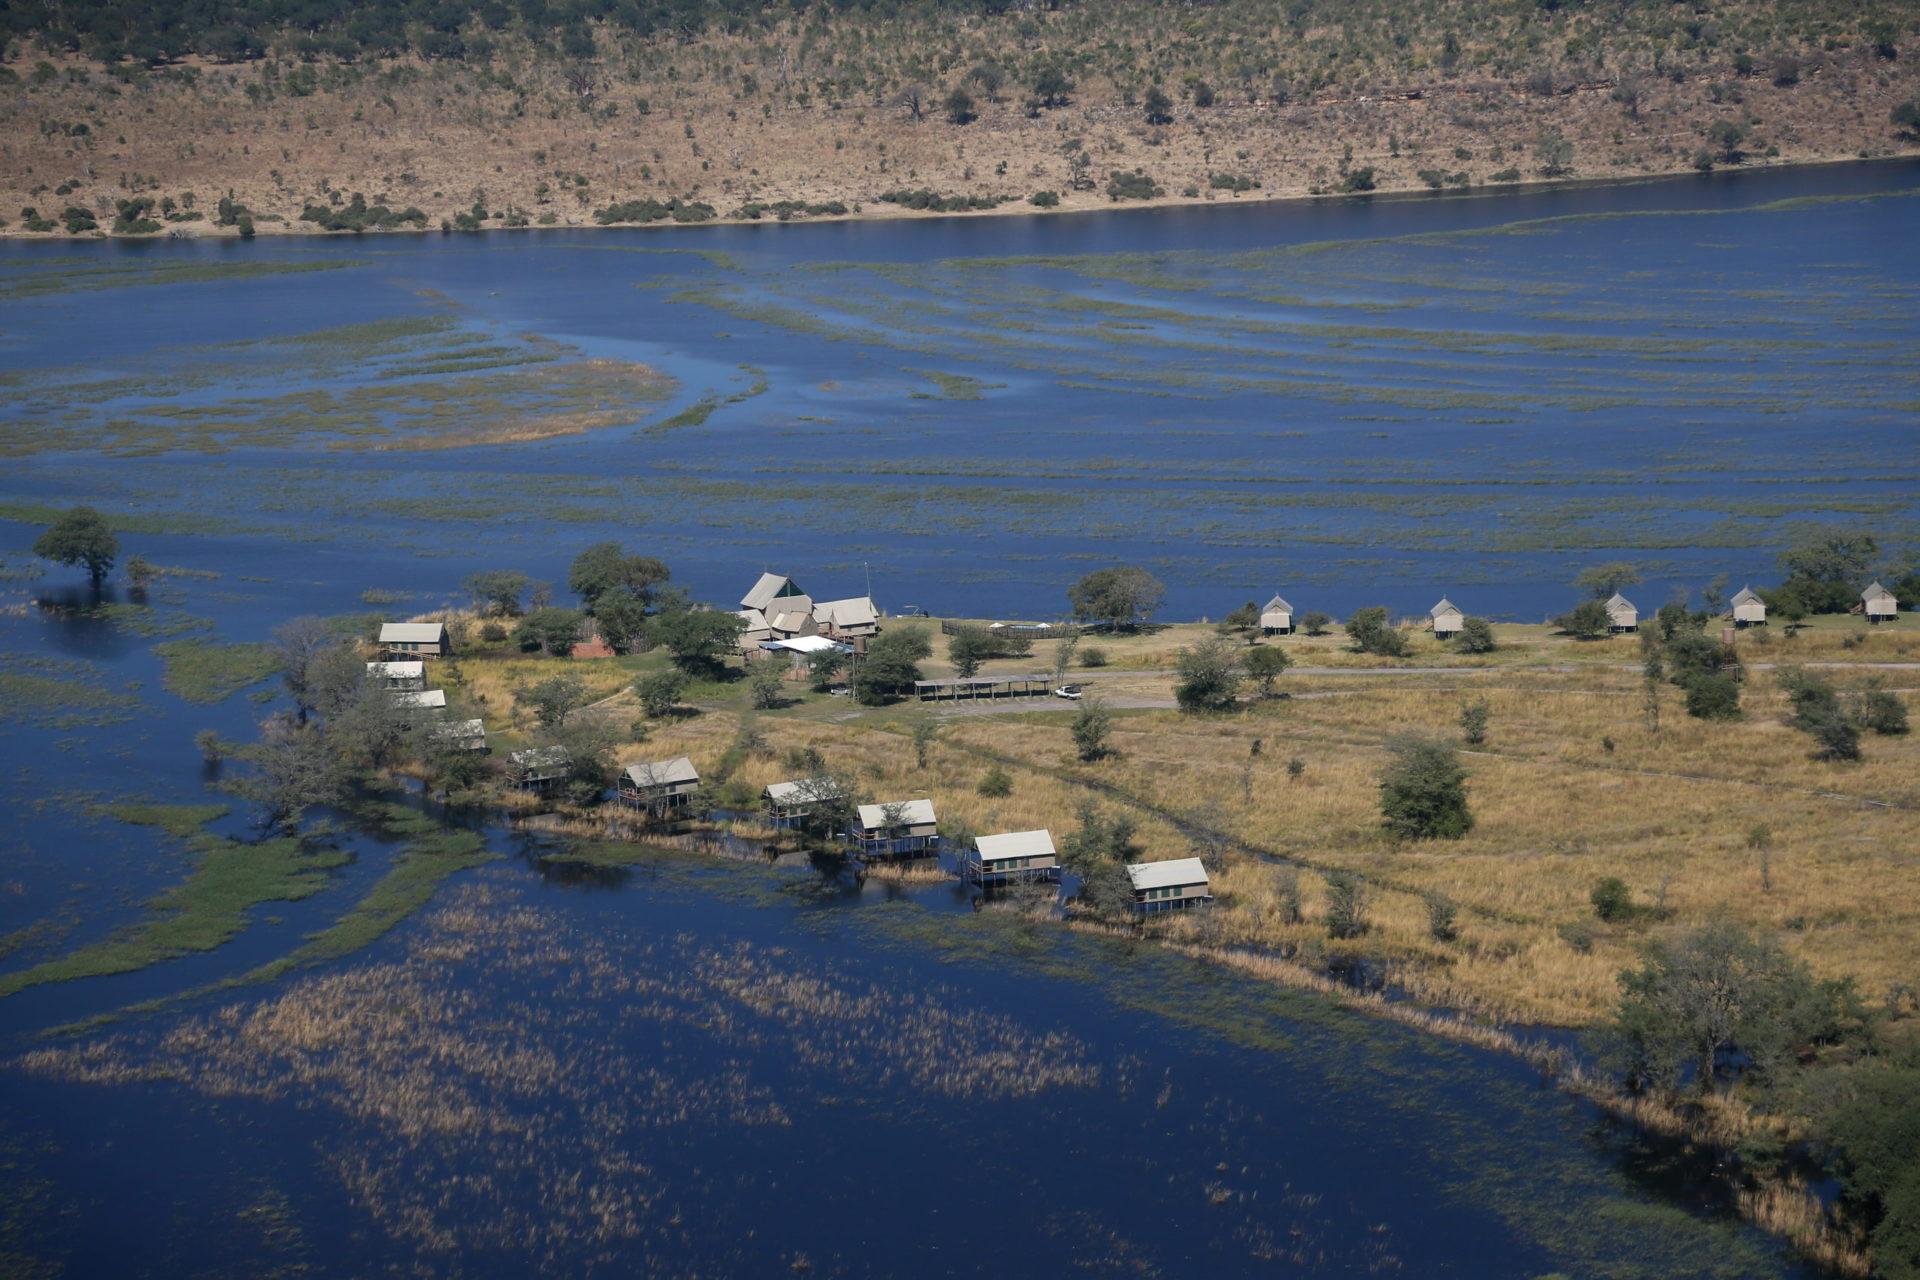 Namibia - 1552 - Chobe River Camp - Aerial